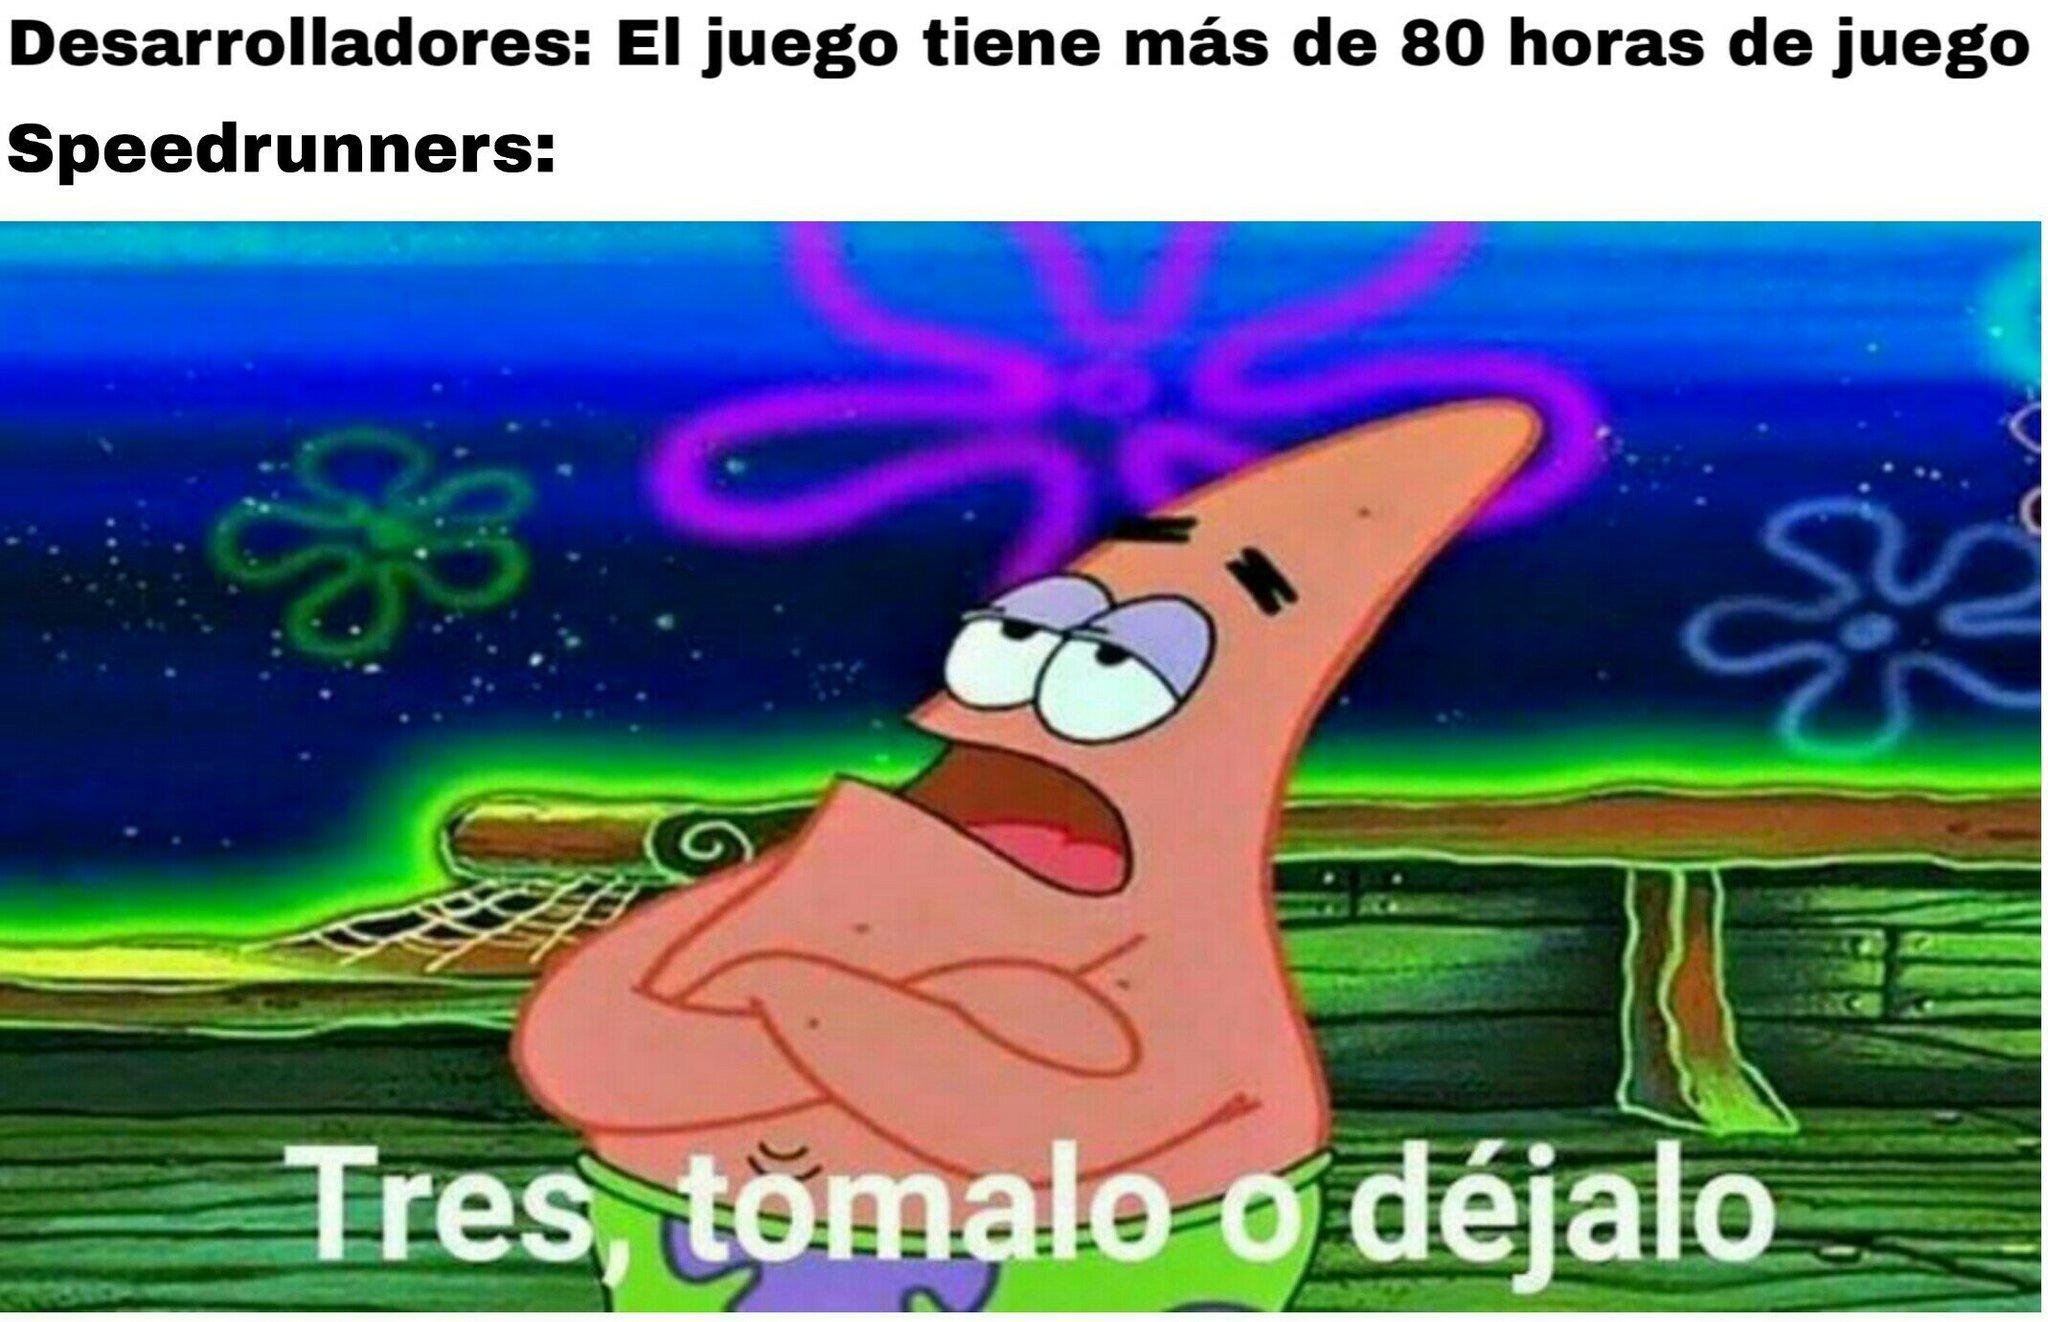 Tres tomalo o dejalo - Meme by R3p0st :) Memedroid